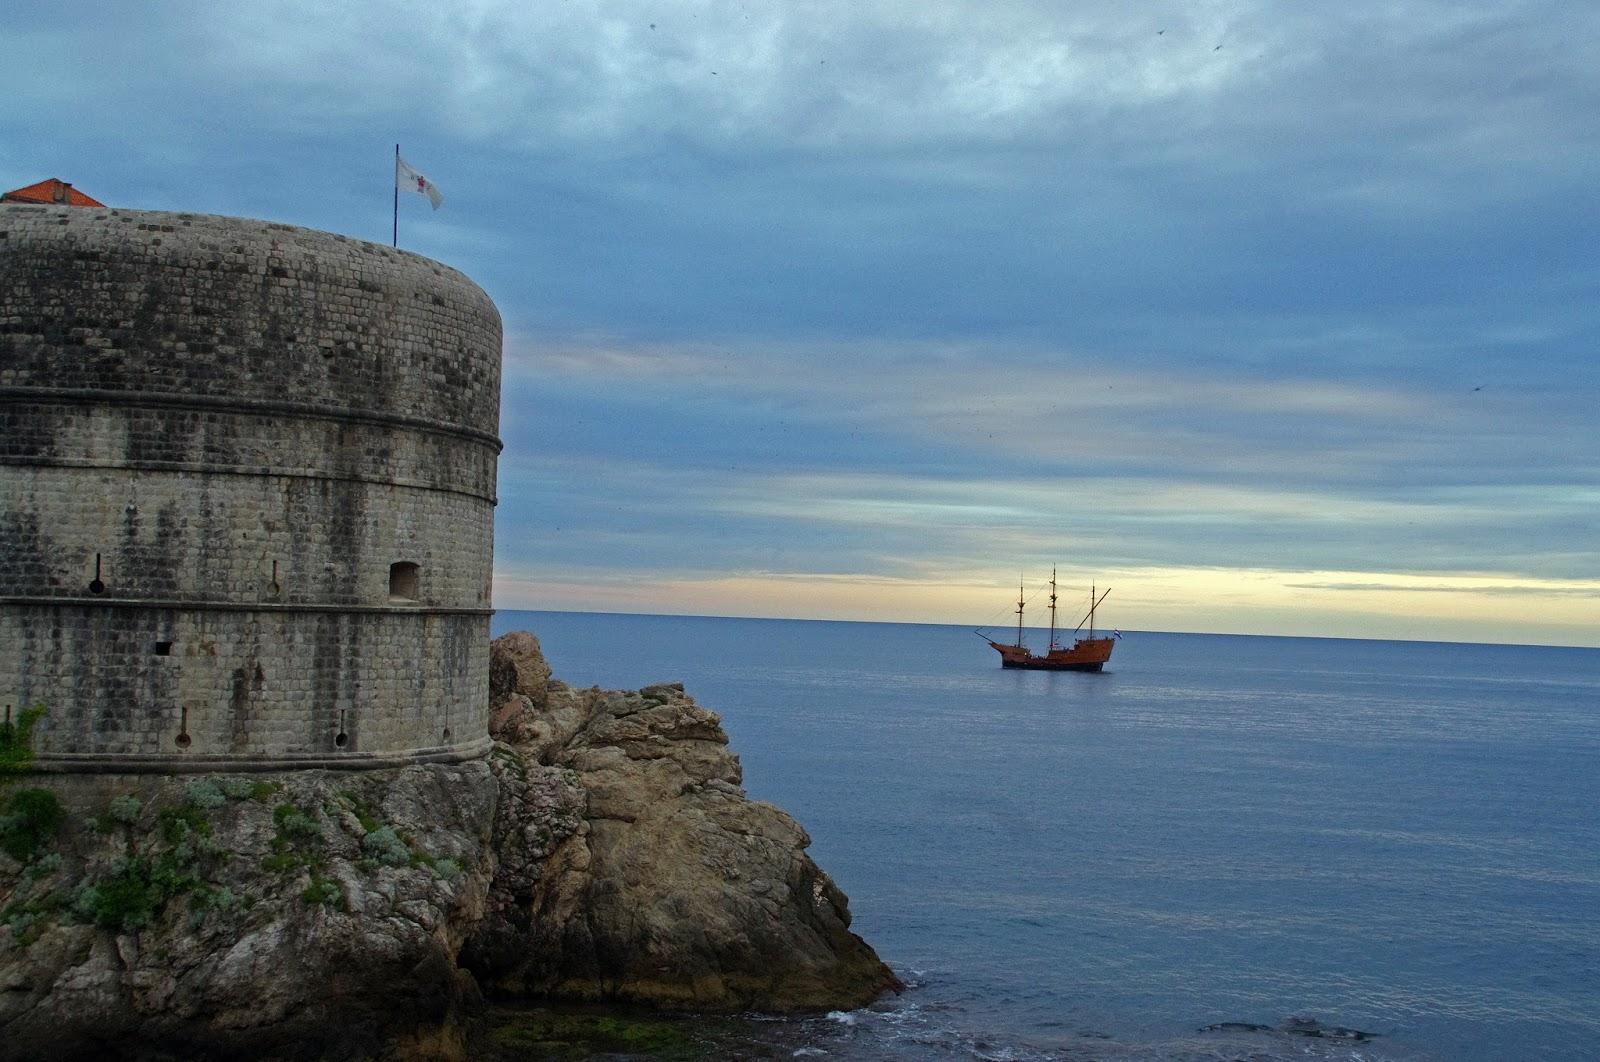 Pirate ship at Nautika Restaurant Dubrovnik